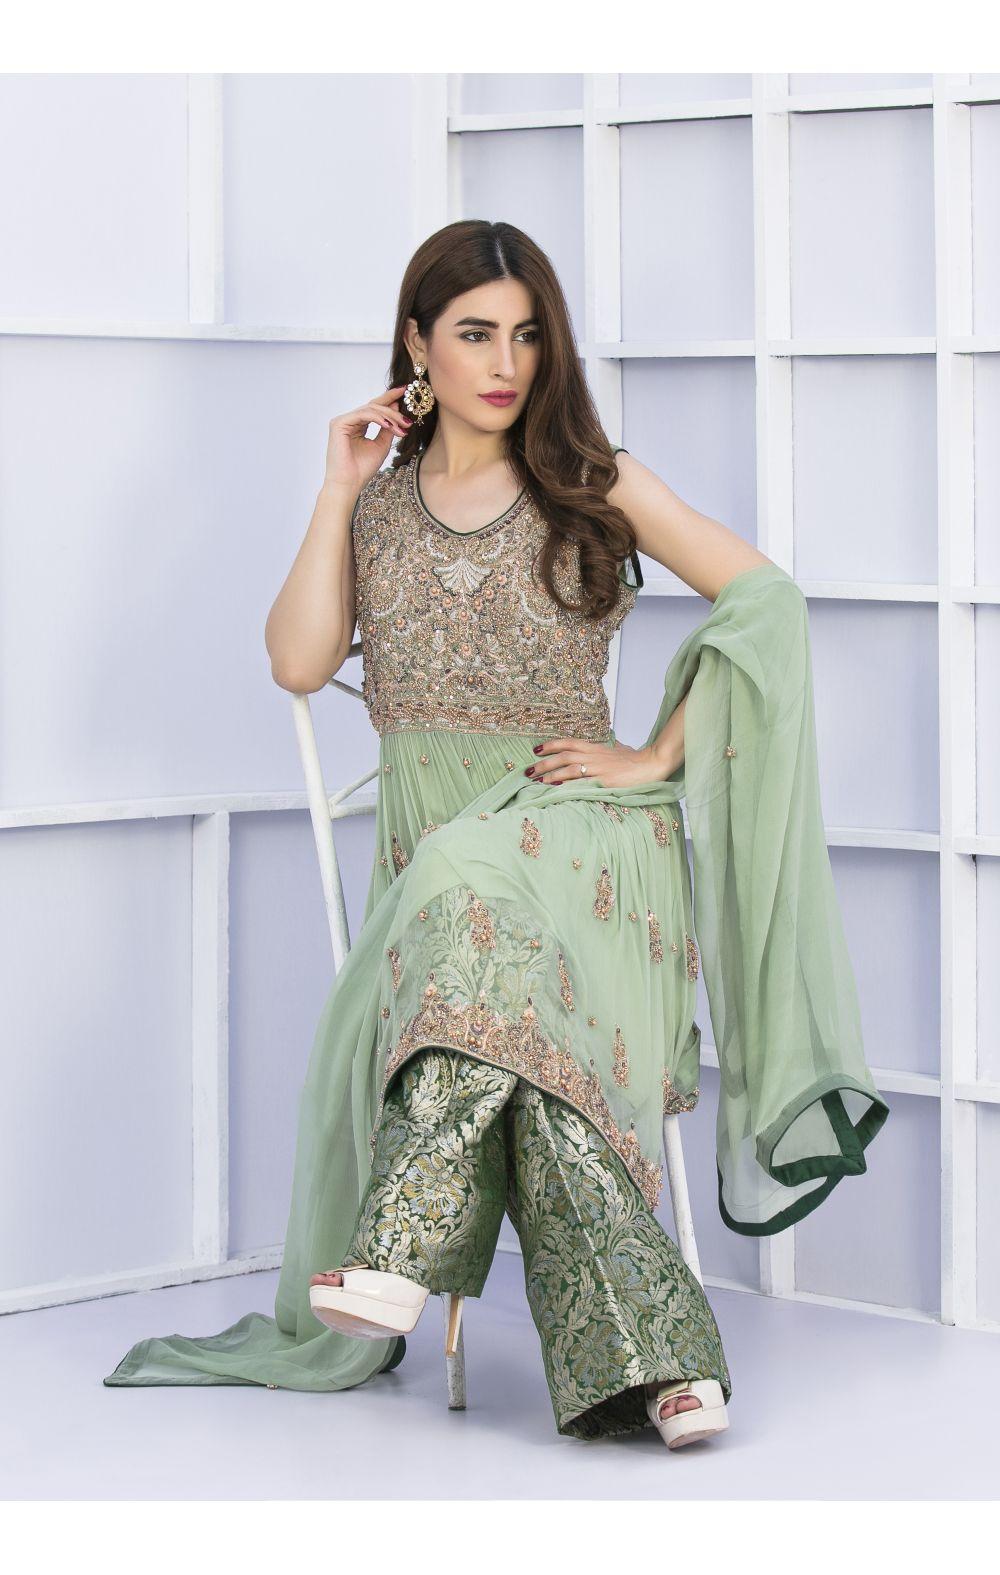 Buy Exclusive Pista Green And Bottle Green Bridal Wear – G15127 Online In USA, Uk & Pakistan - 03